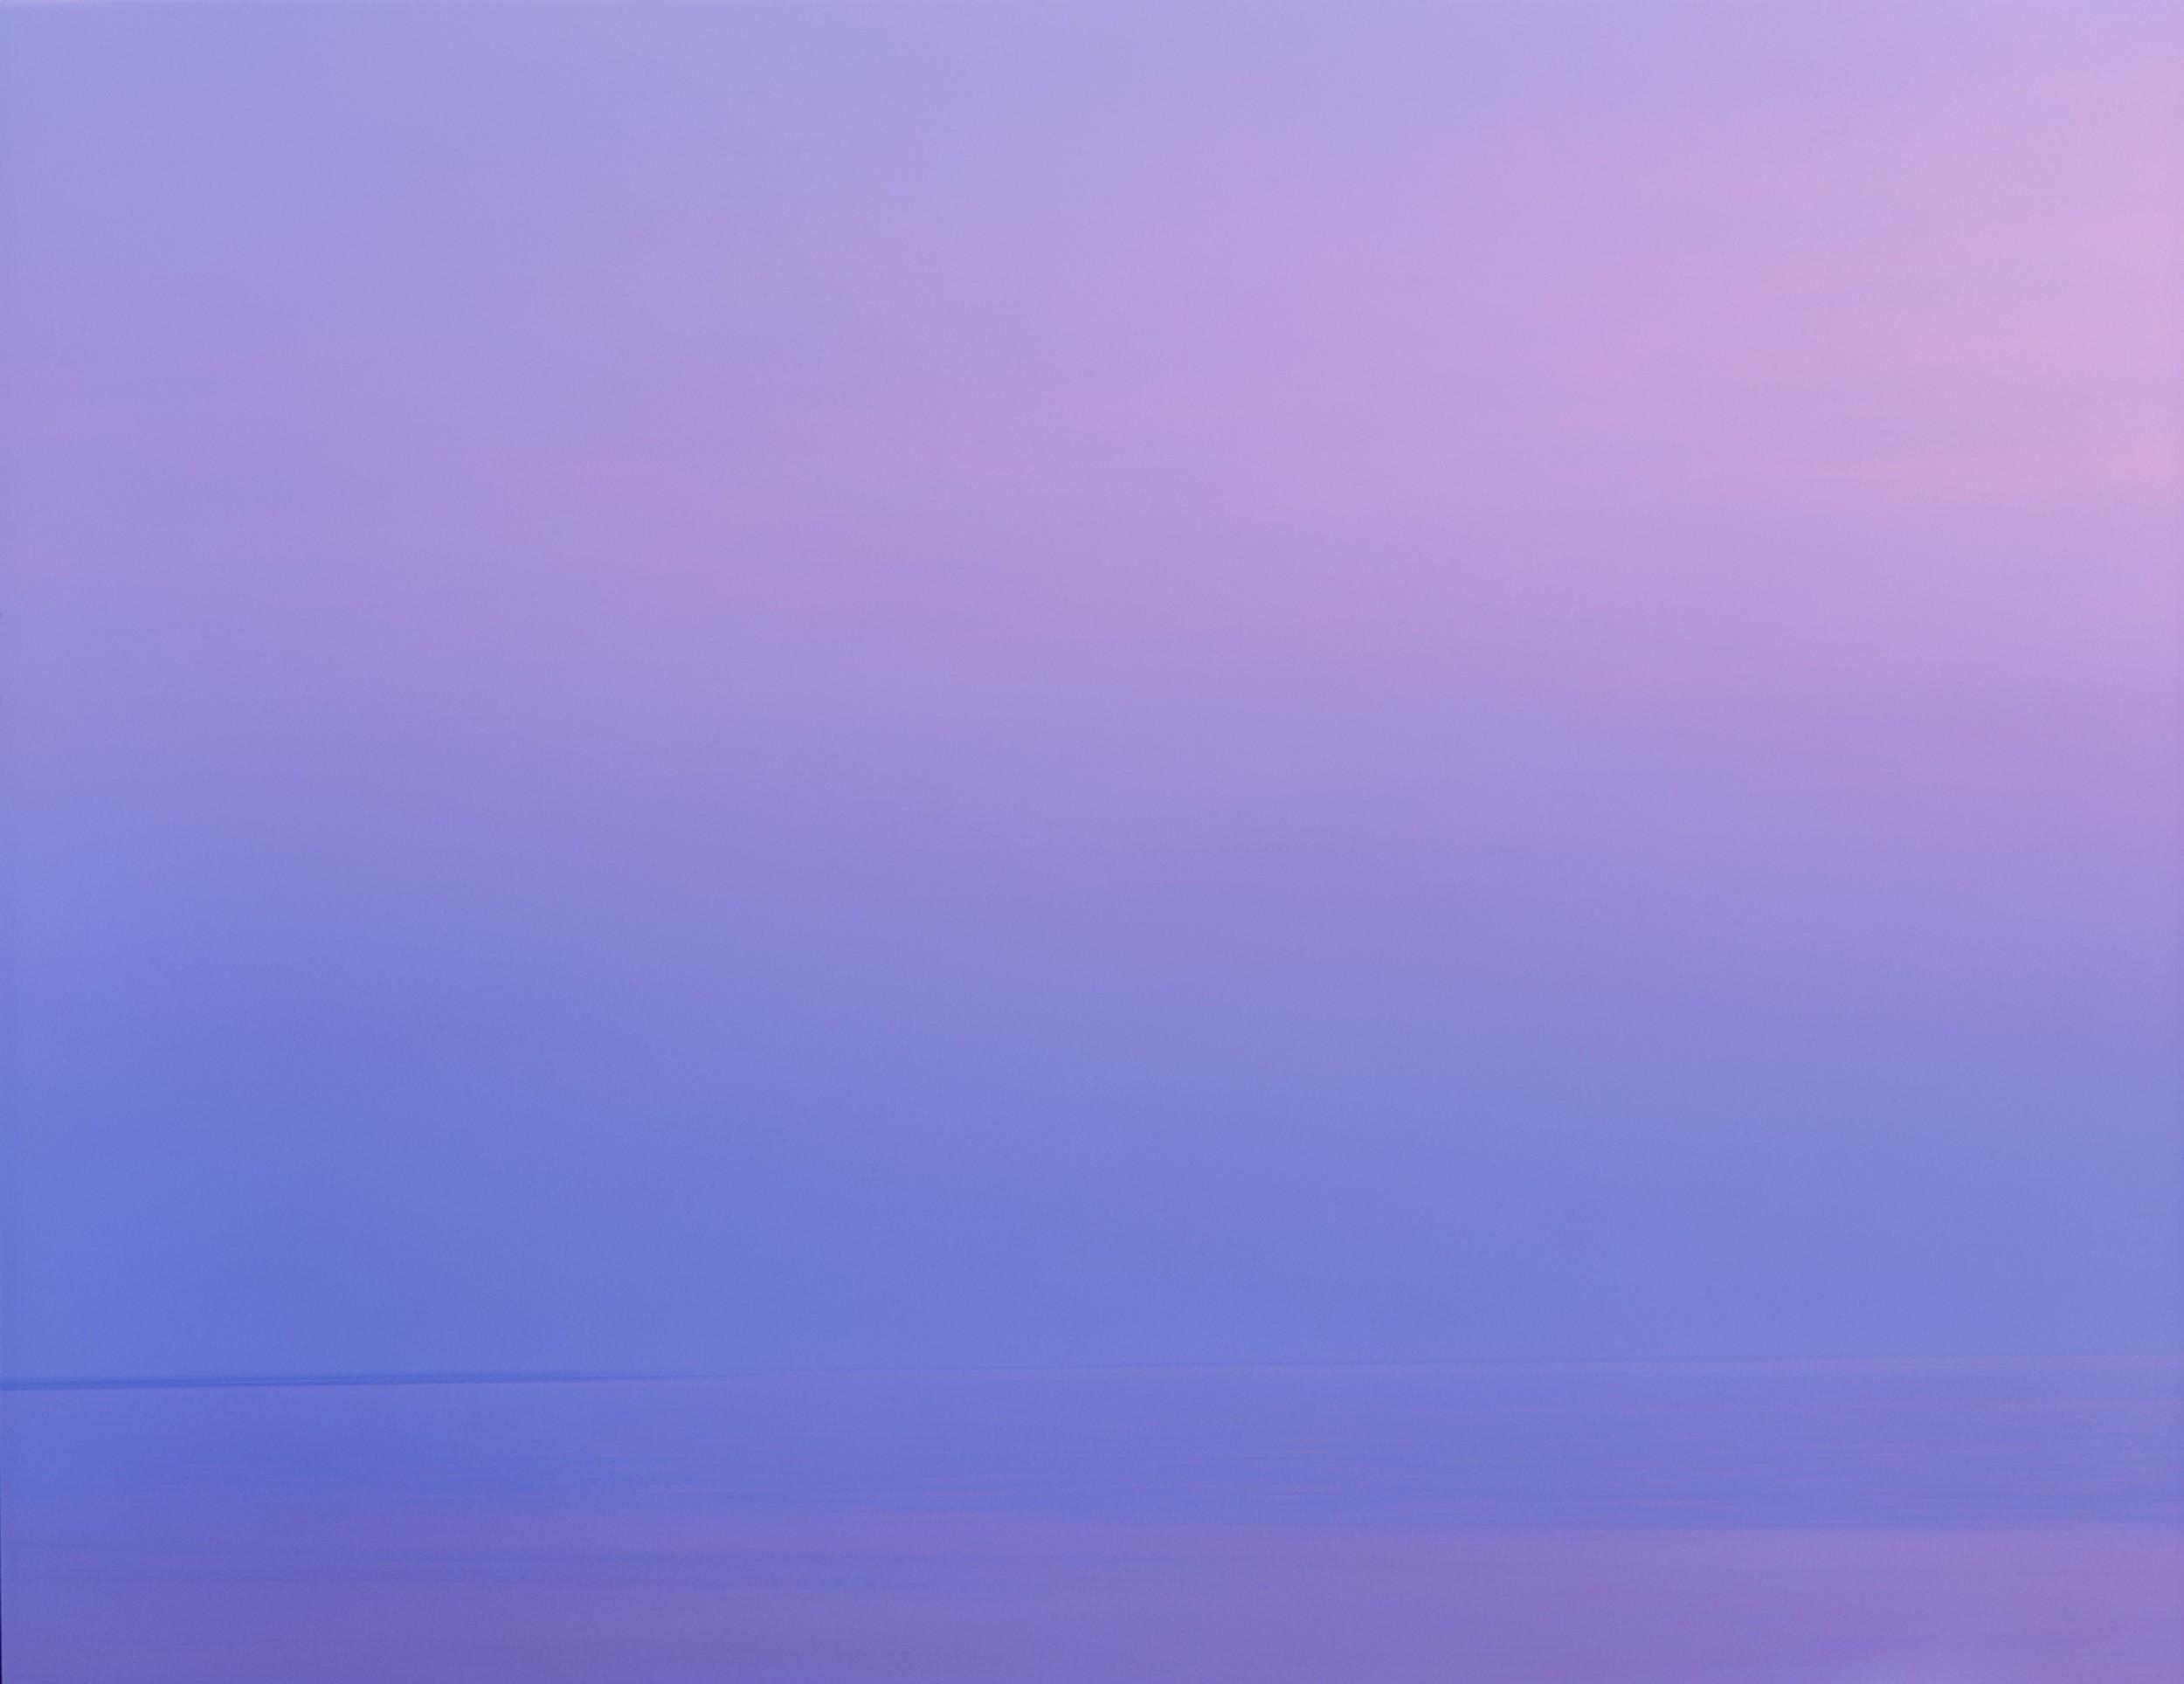 02.039 Lake Michigan.JPG